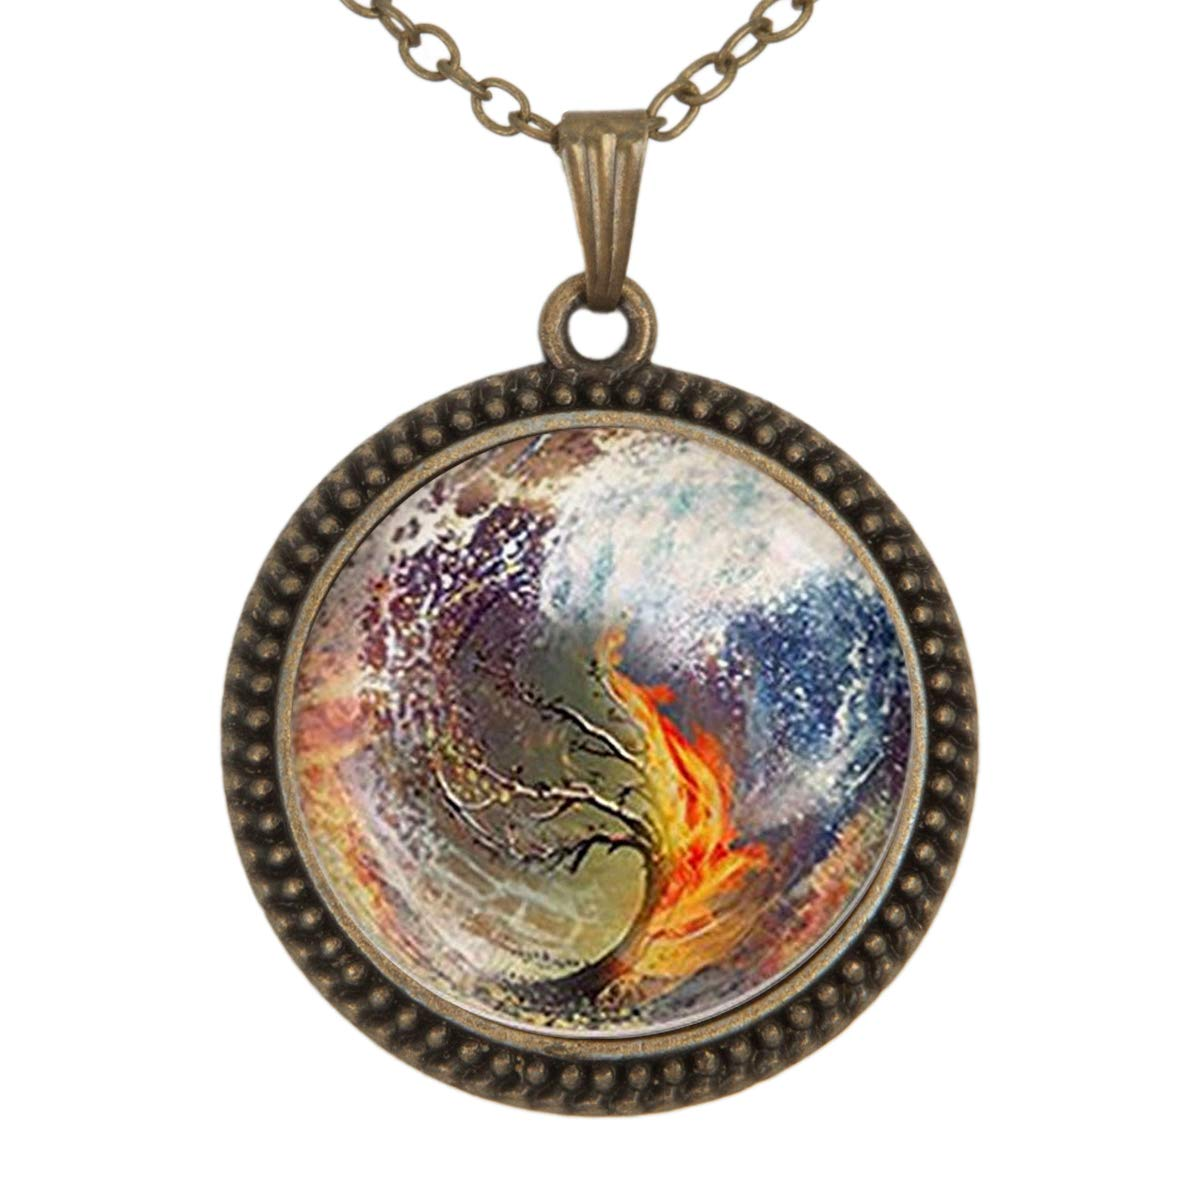 Family Decor Insurgent Sea Tsunami Pendant Necklace Cabochon Glass Vintage Bronze Chain Necklace Jewelry Handmade